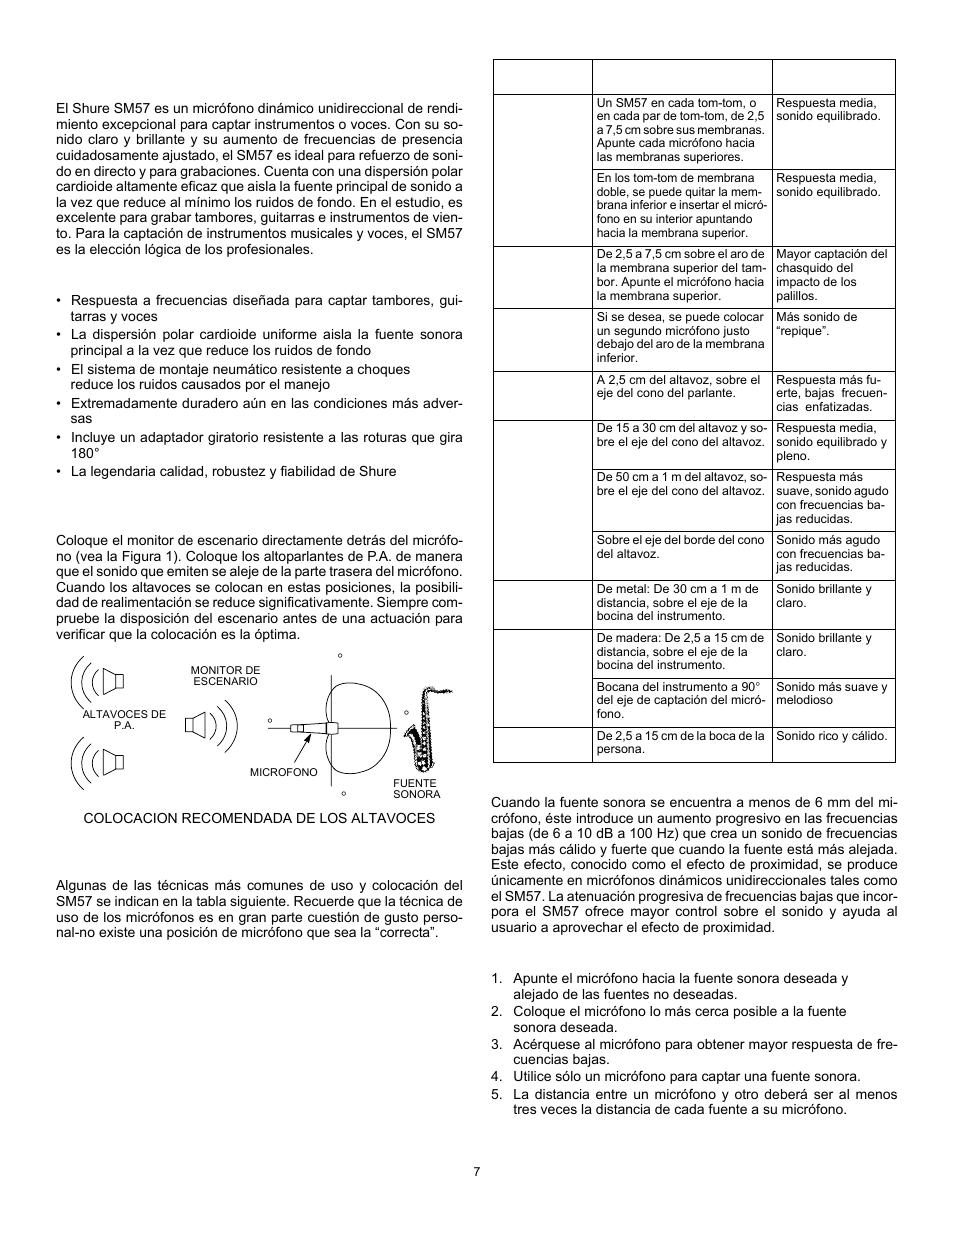 modelo sm57 shure sm57 user manual page 7 12 original mode rh manualsdir com Shure Beta 58A shure sm57 user guide